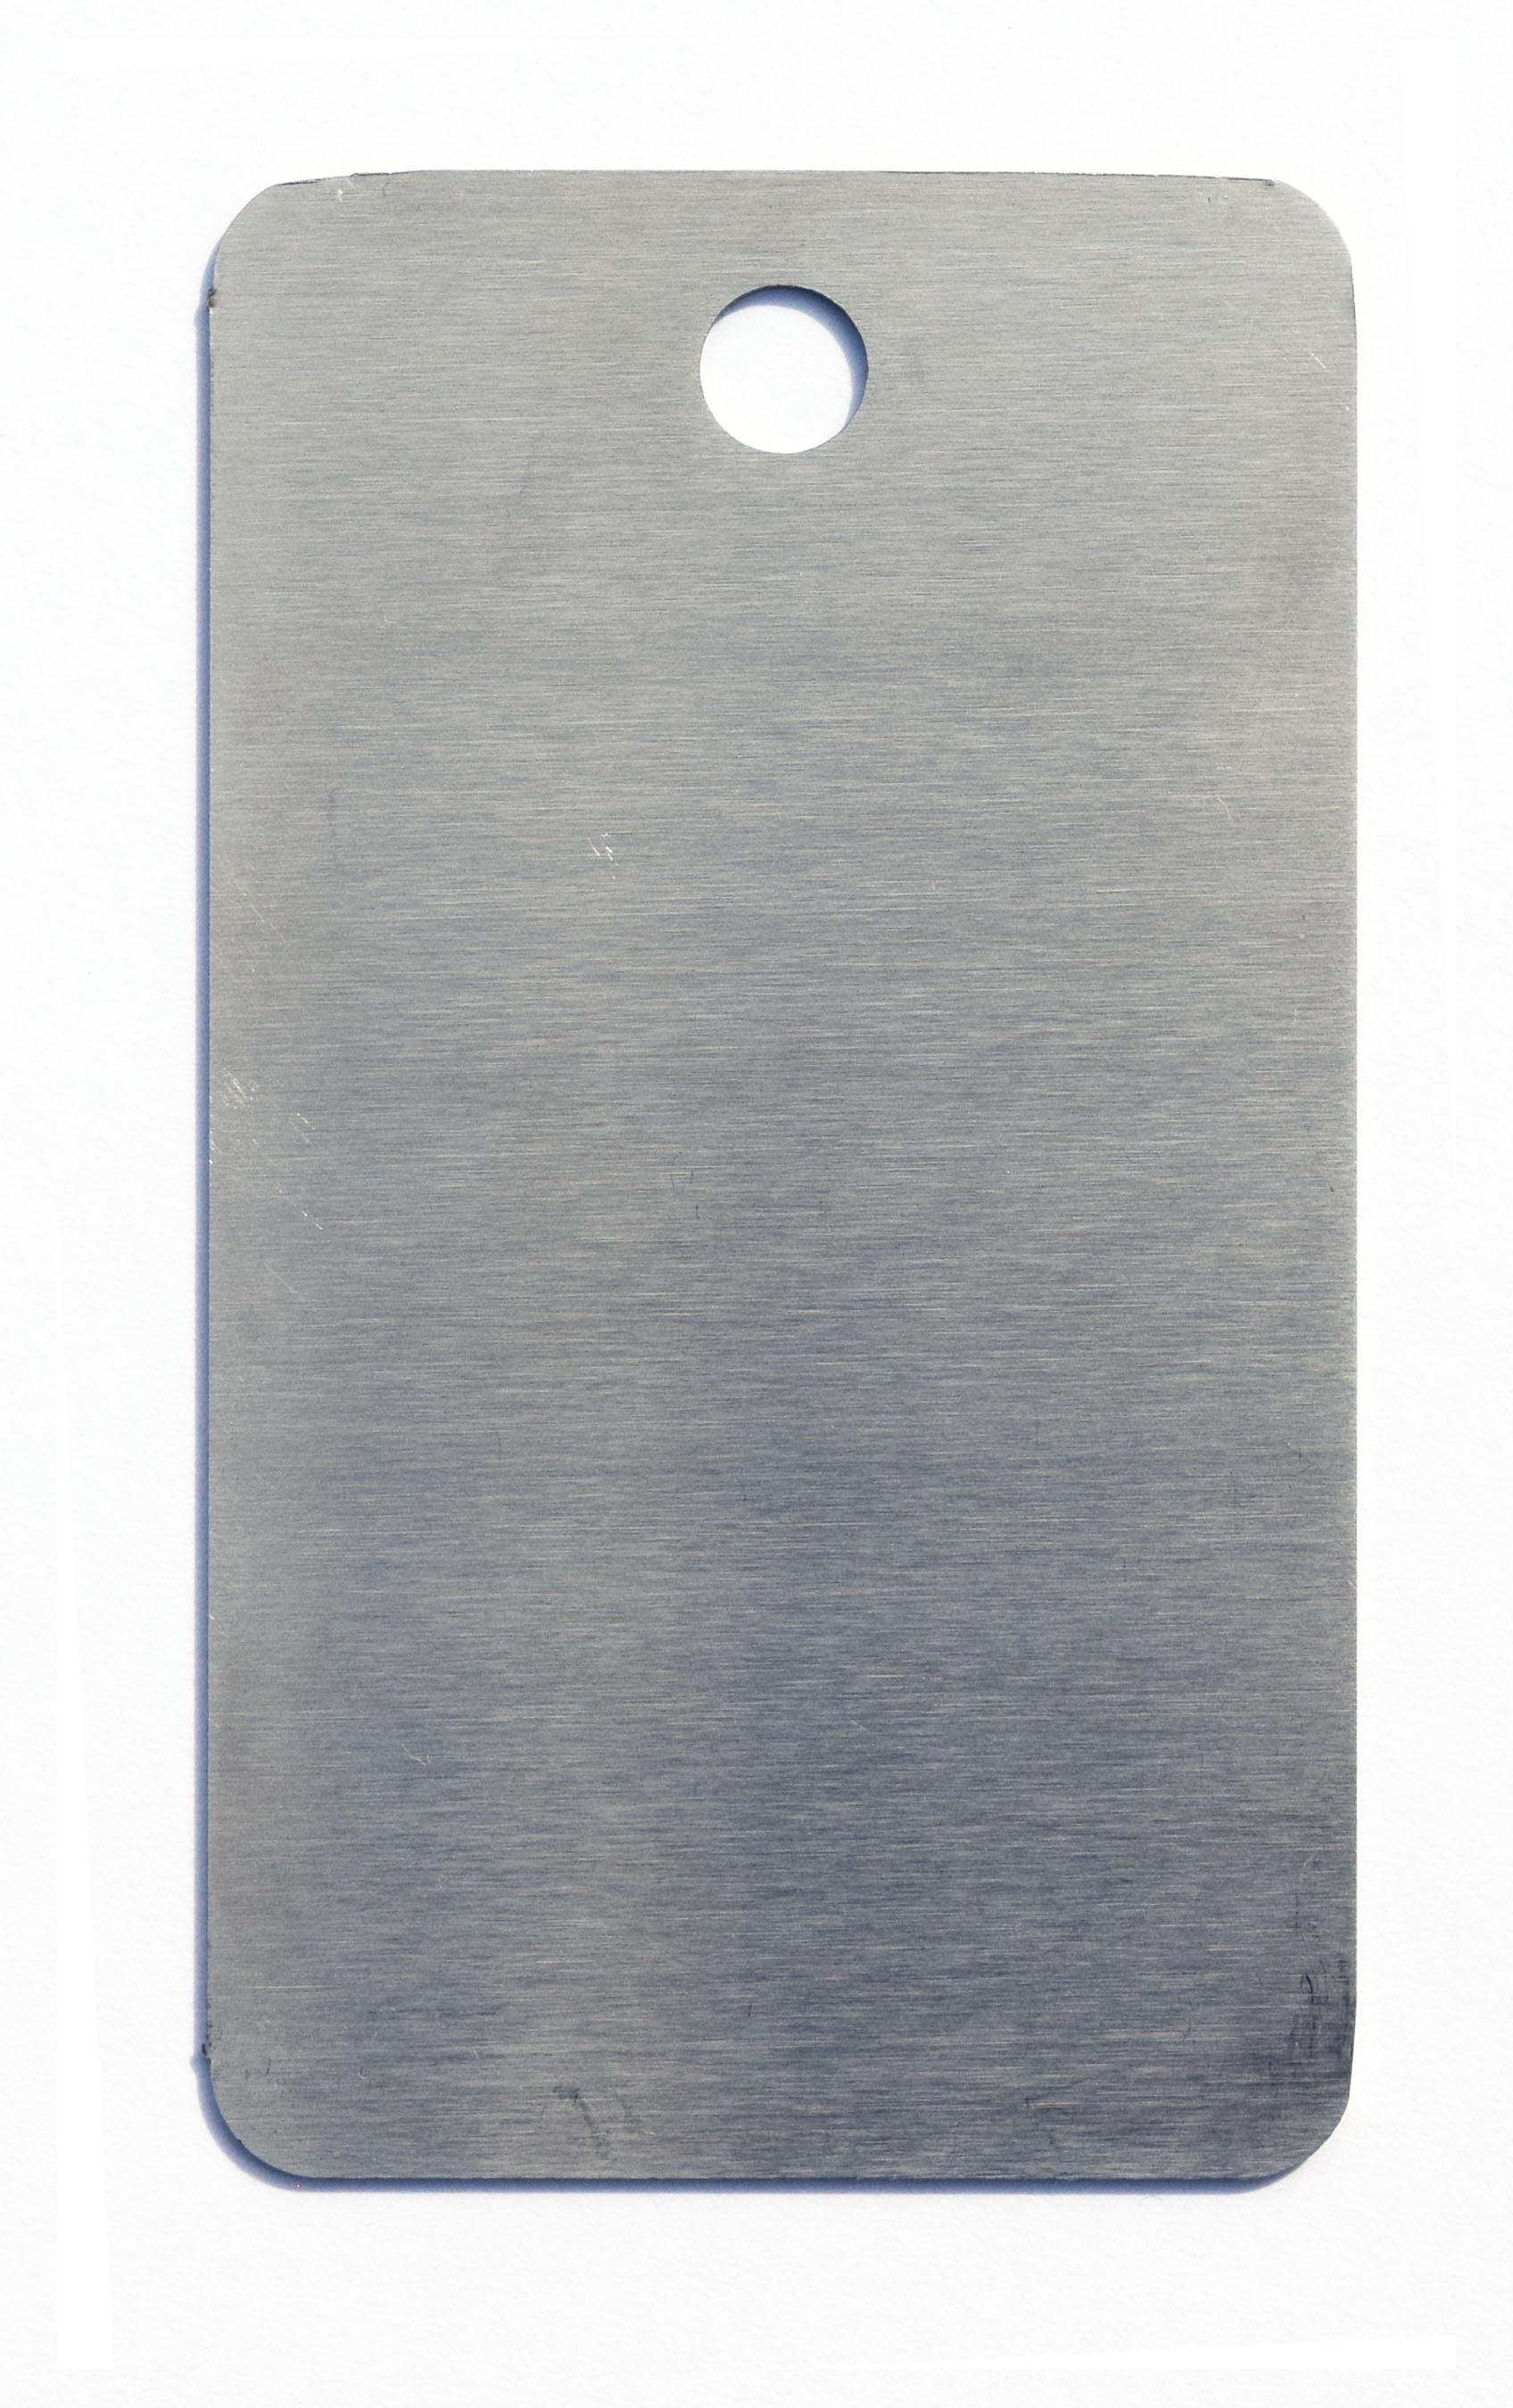 brushed-stainless-steel-ventandcover-copy.jpg